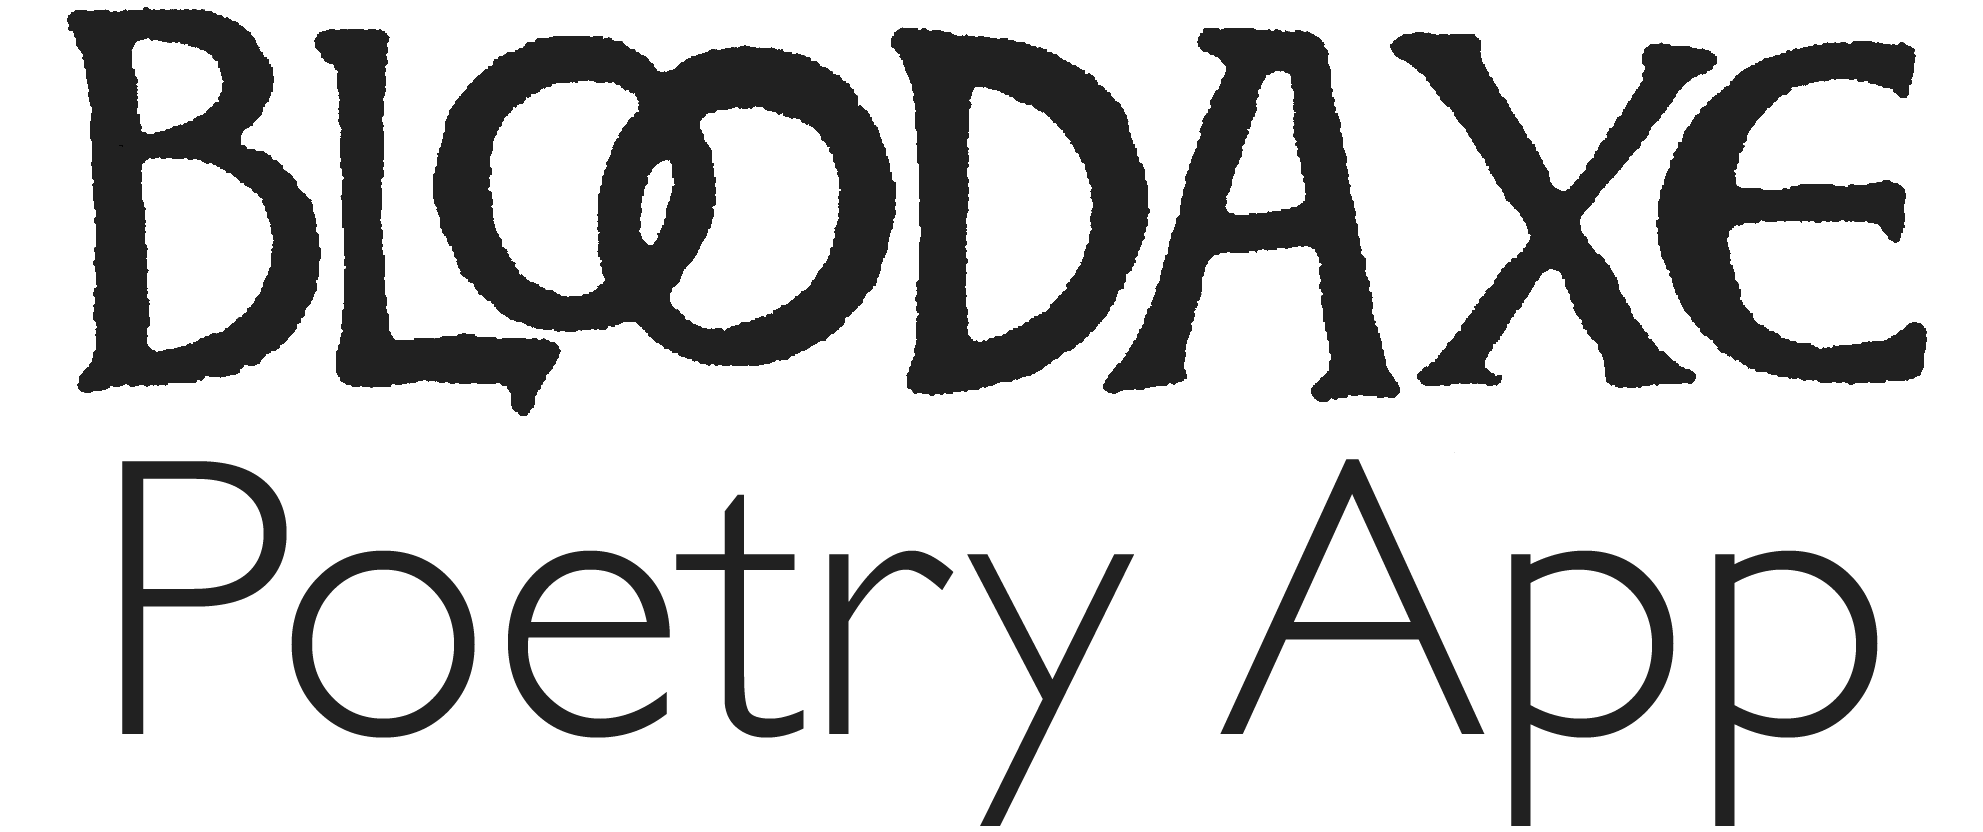 Bloodaxe Poetry App